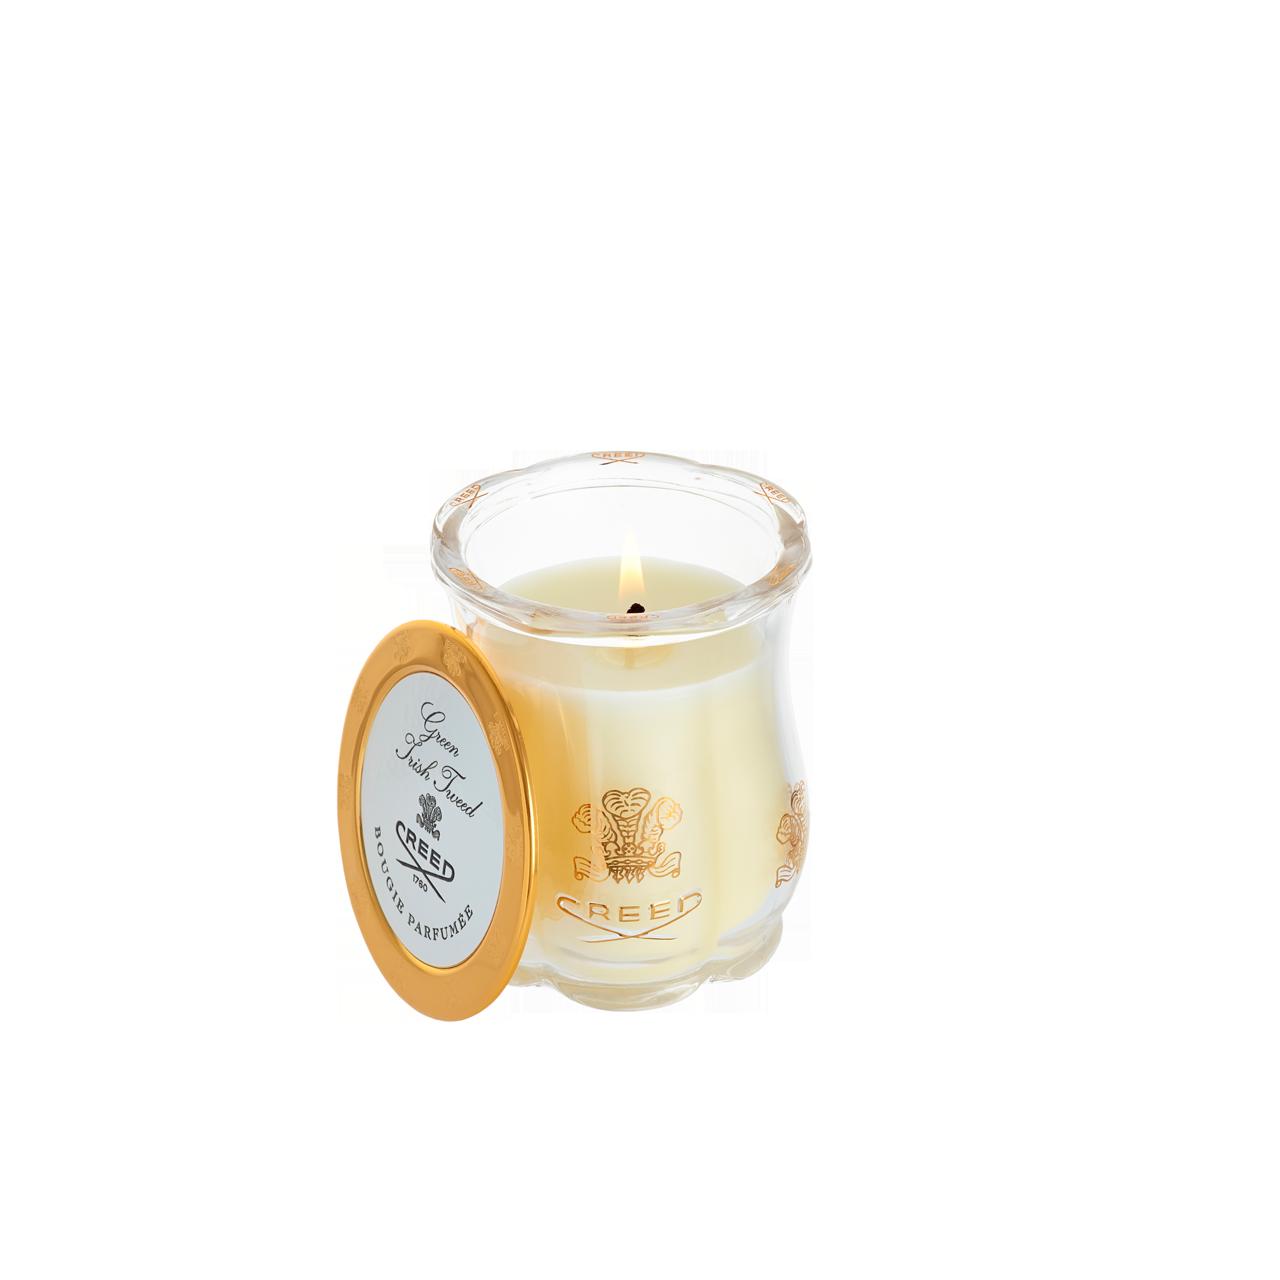 Green Irish Tweed Candle